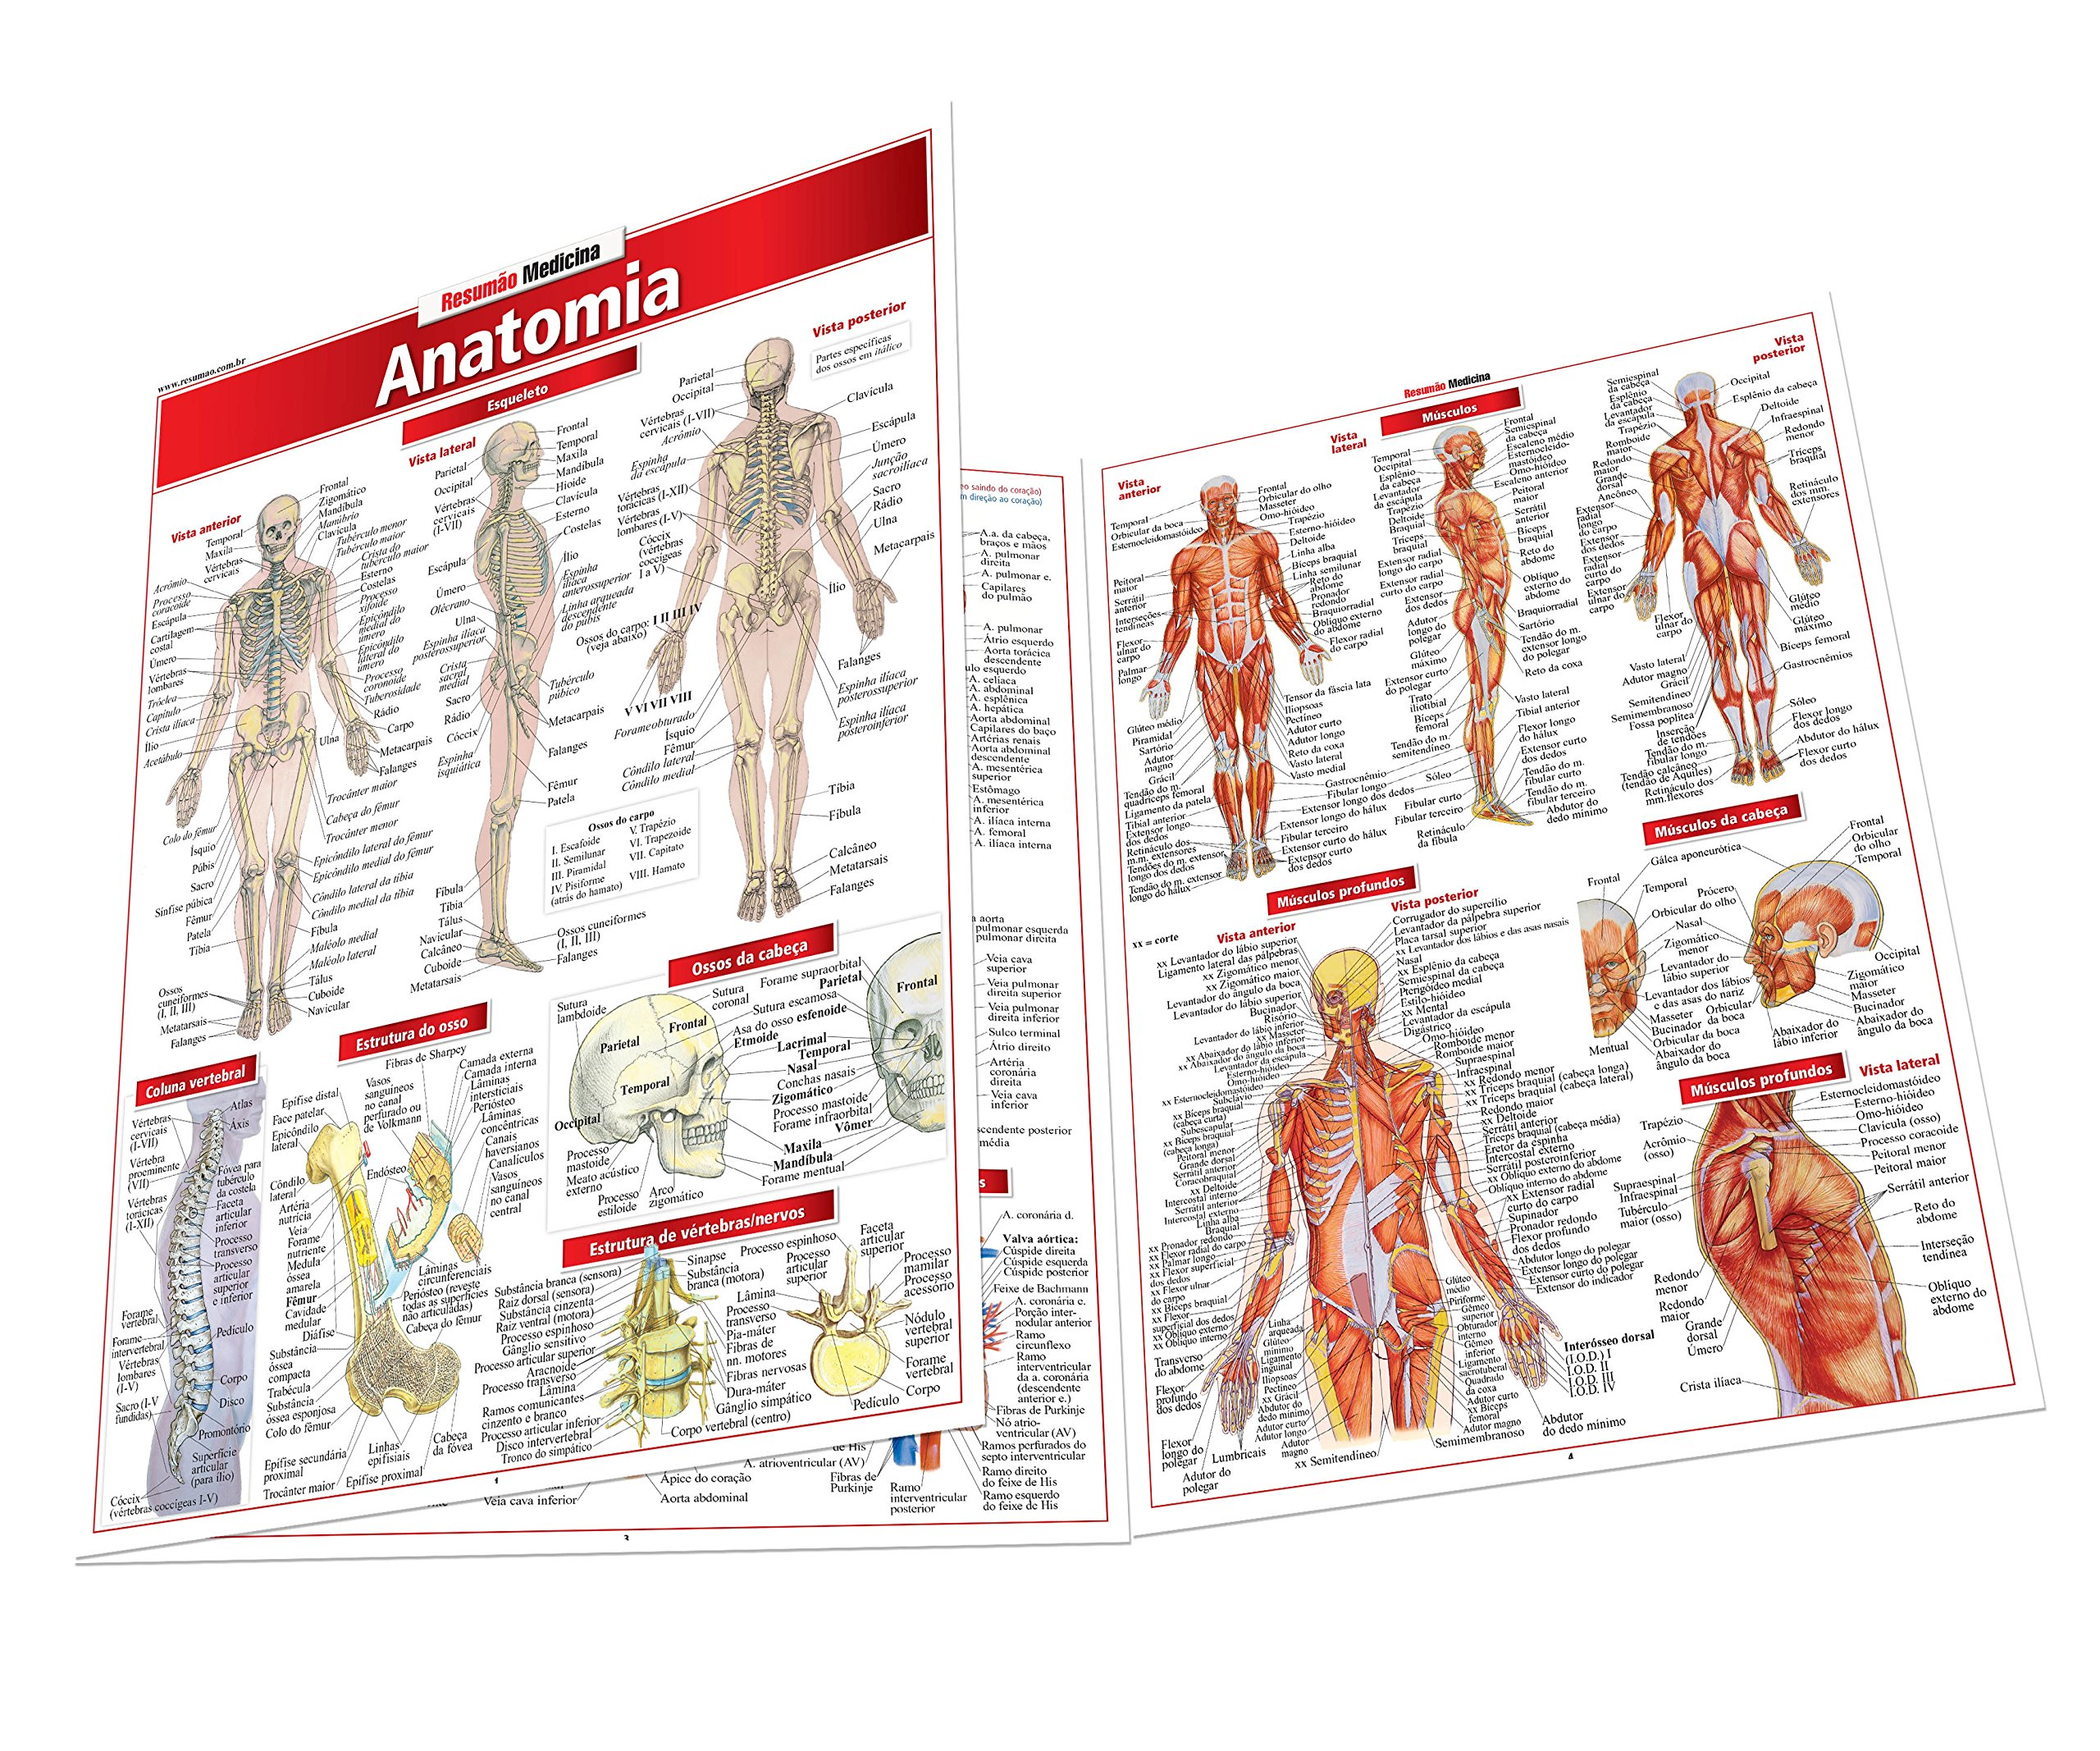 Anatomia: Vincent Perez: 9788588749245: Amazon.com: Books